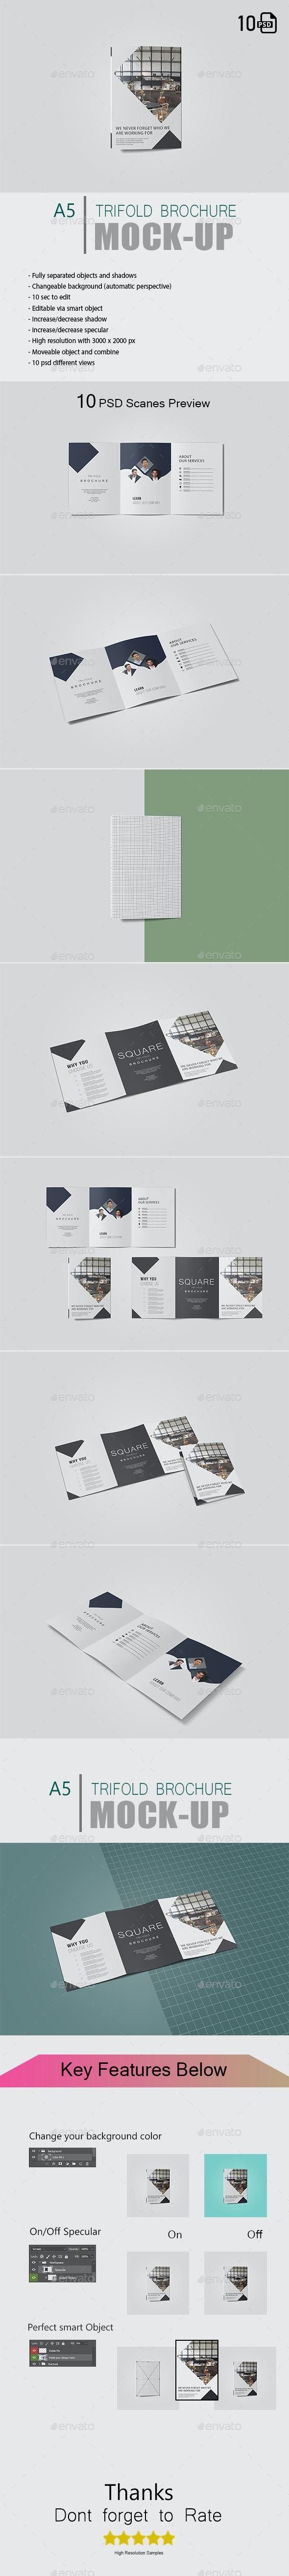 A5 Trifold Brochure Mockup - Brochures Print